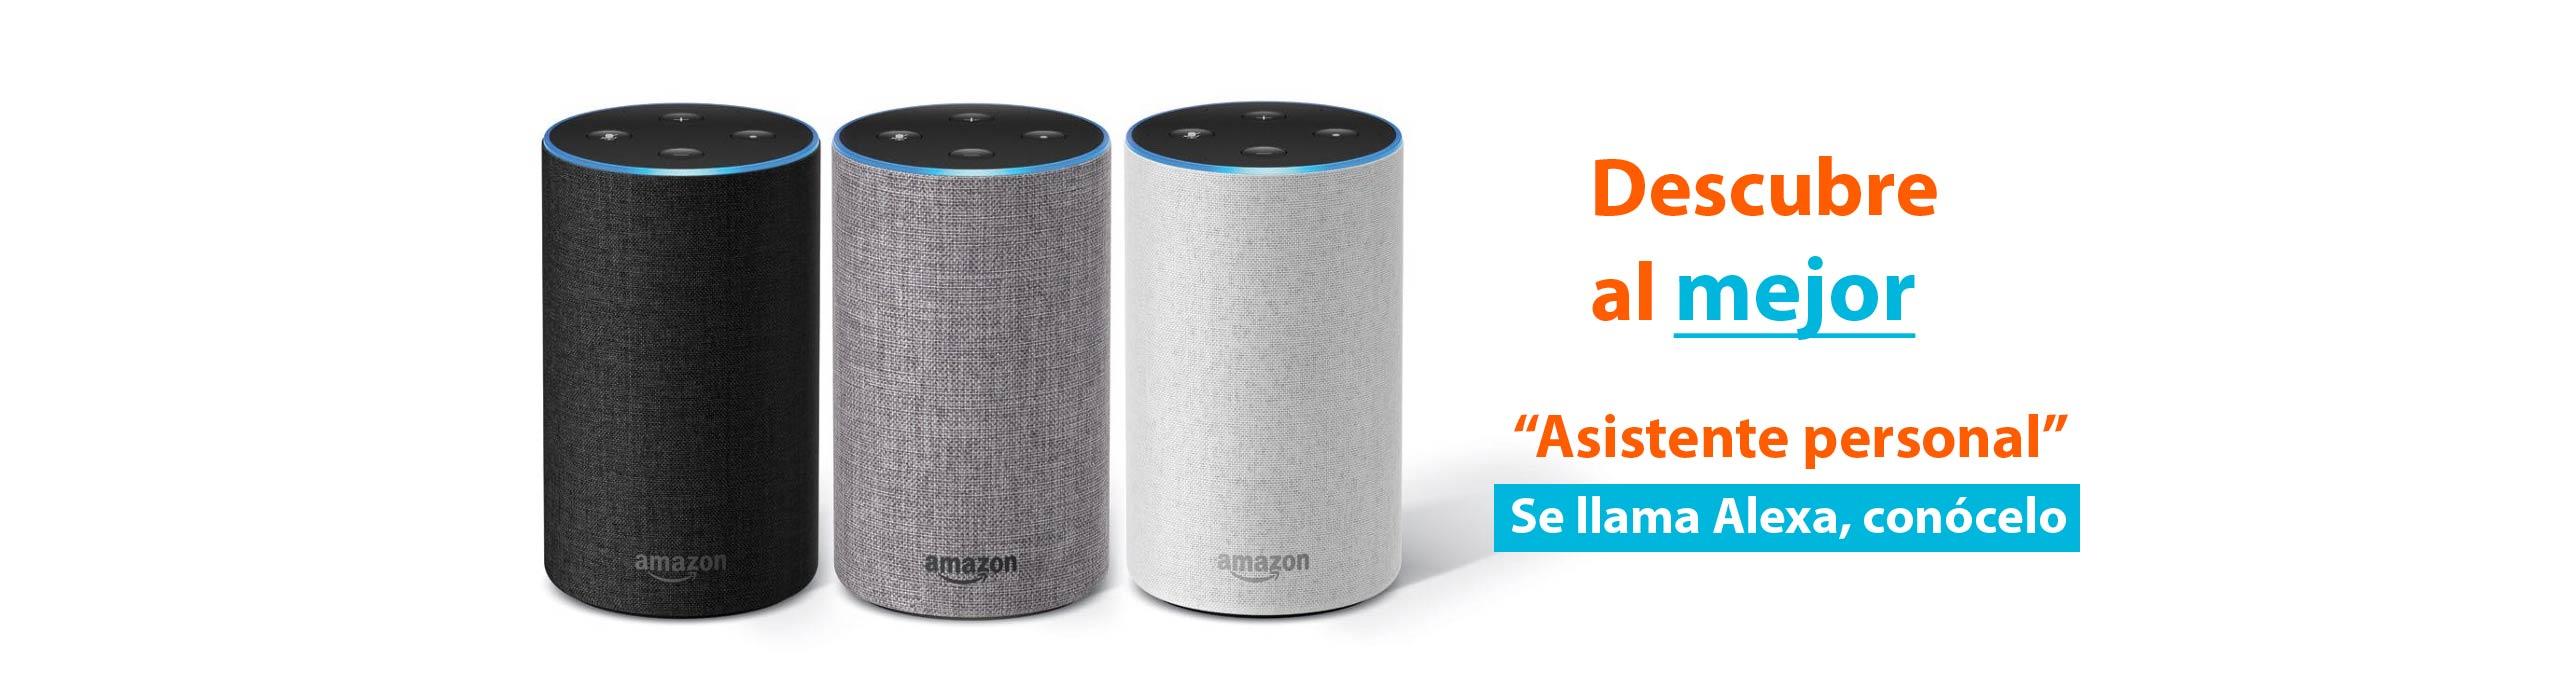 casa inteligente Alexa